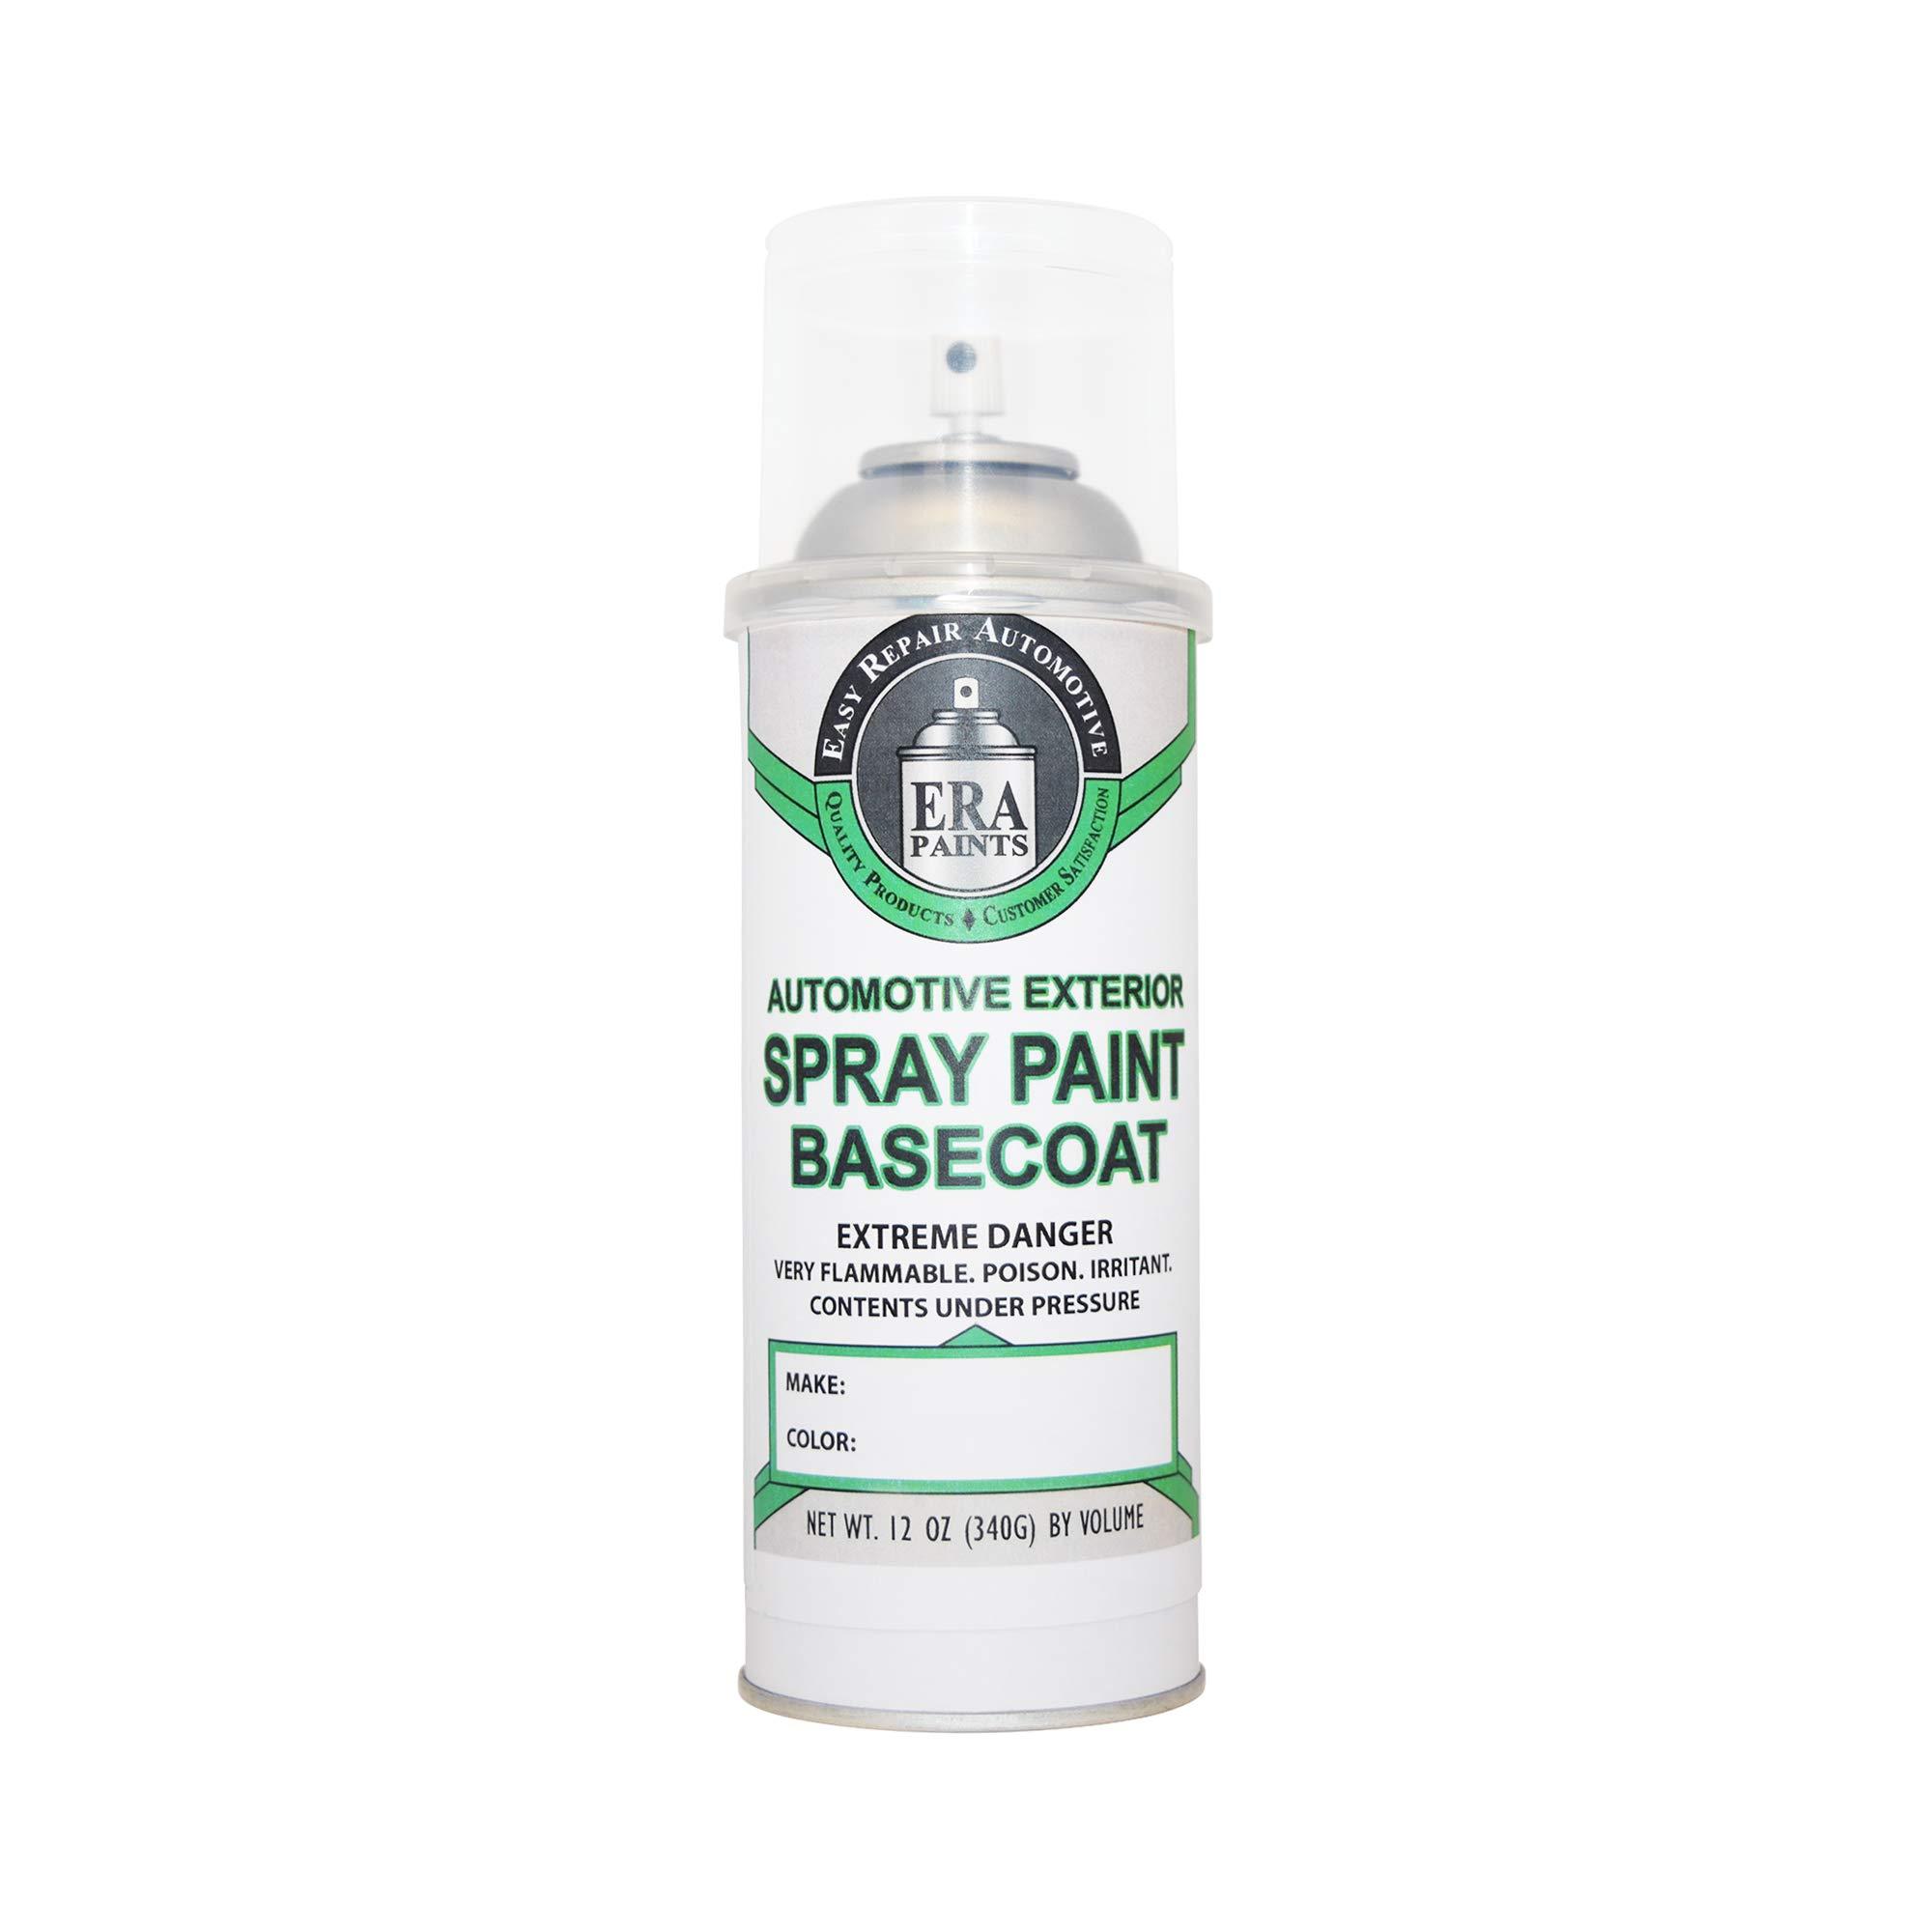 ERA Paints for Dodge Ram Series 2005-2013 (PDM Mineral Gray Metallic) Automotive Spray (Basecoat) Paint